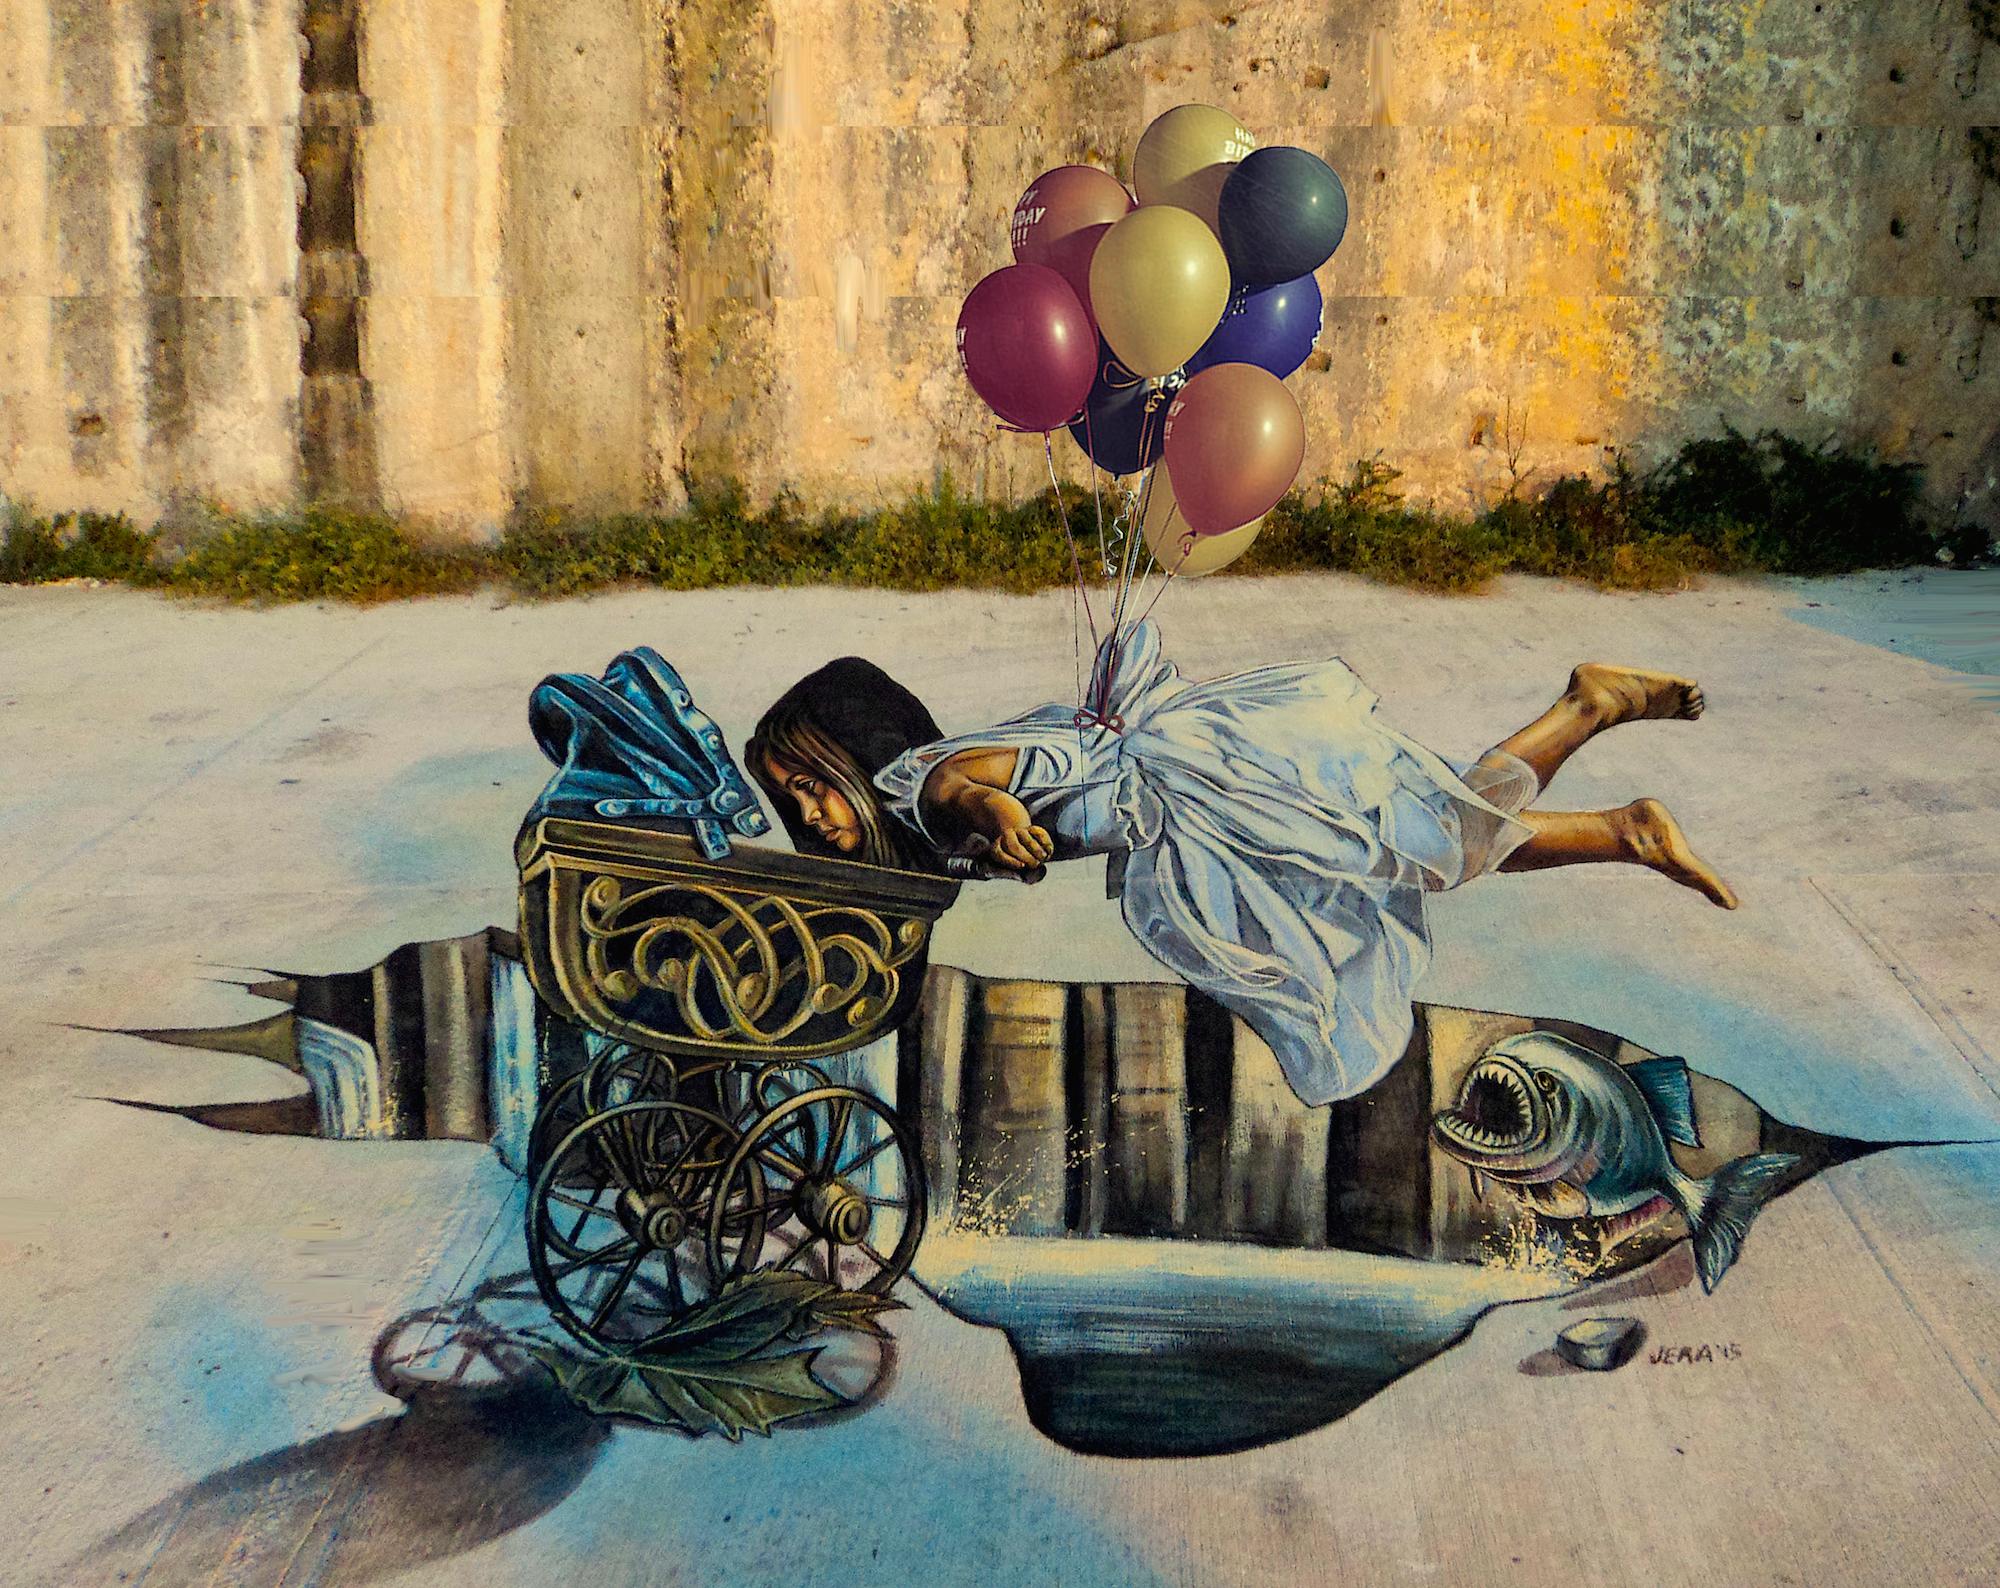 verabugatti streetart arteurbana illusioniottiche 3Dstreetart anamorfosi anamorfico anamorphic illusions urbanart madonnari3D pavementart 3Dstreetart 3Dstreetpainting environment thereisnotplanetb floatingillusion flyingillusion floatingwithbaloons piranha scary mistero migrants travelling roots